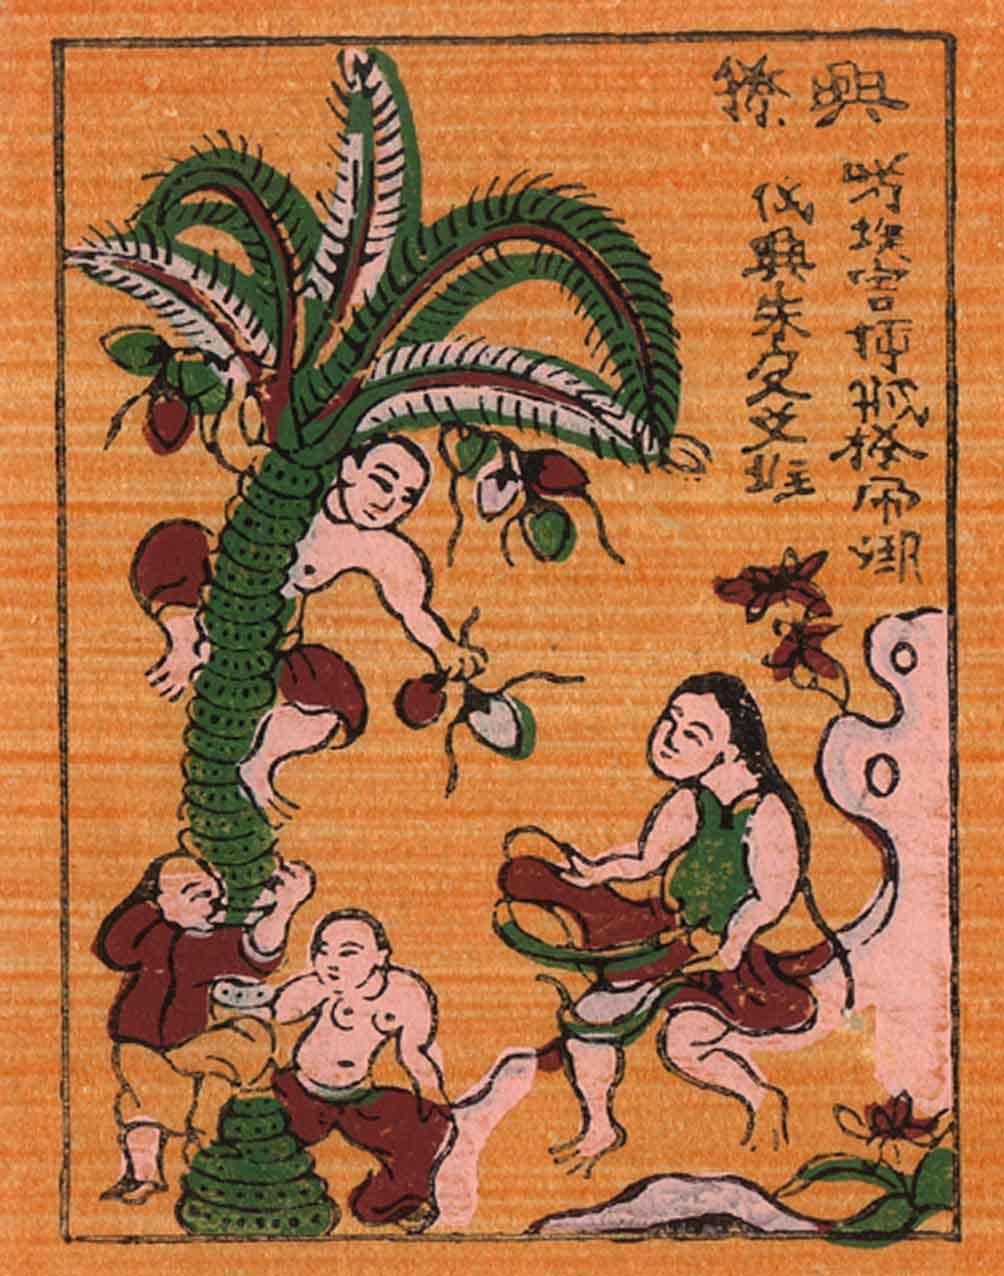 Tranh Hứng Dừa